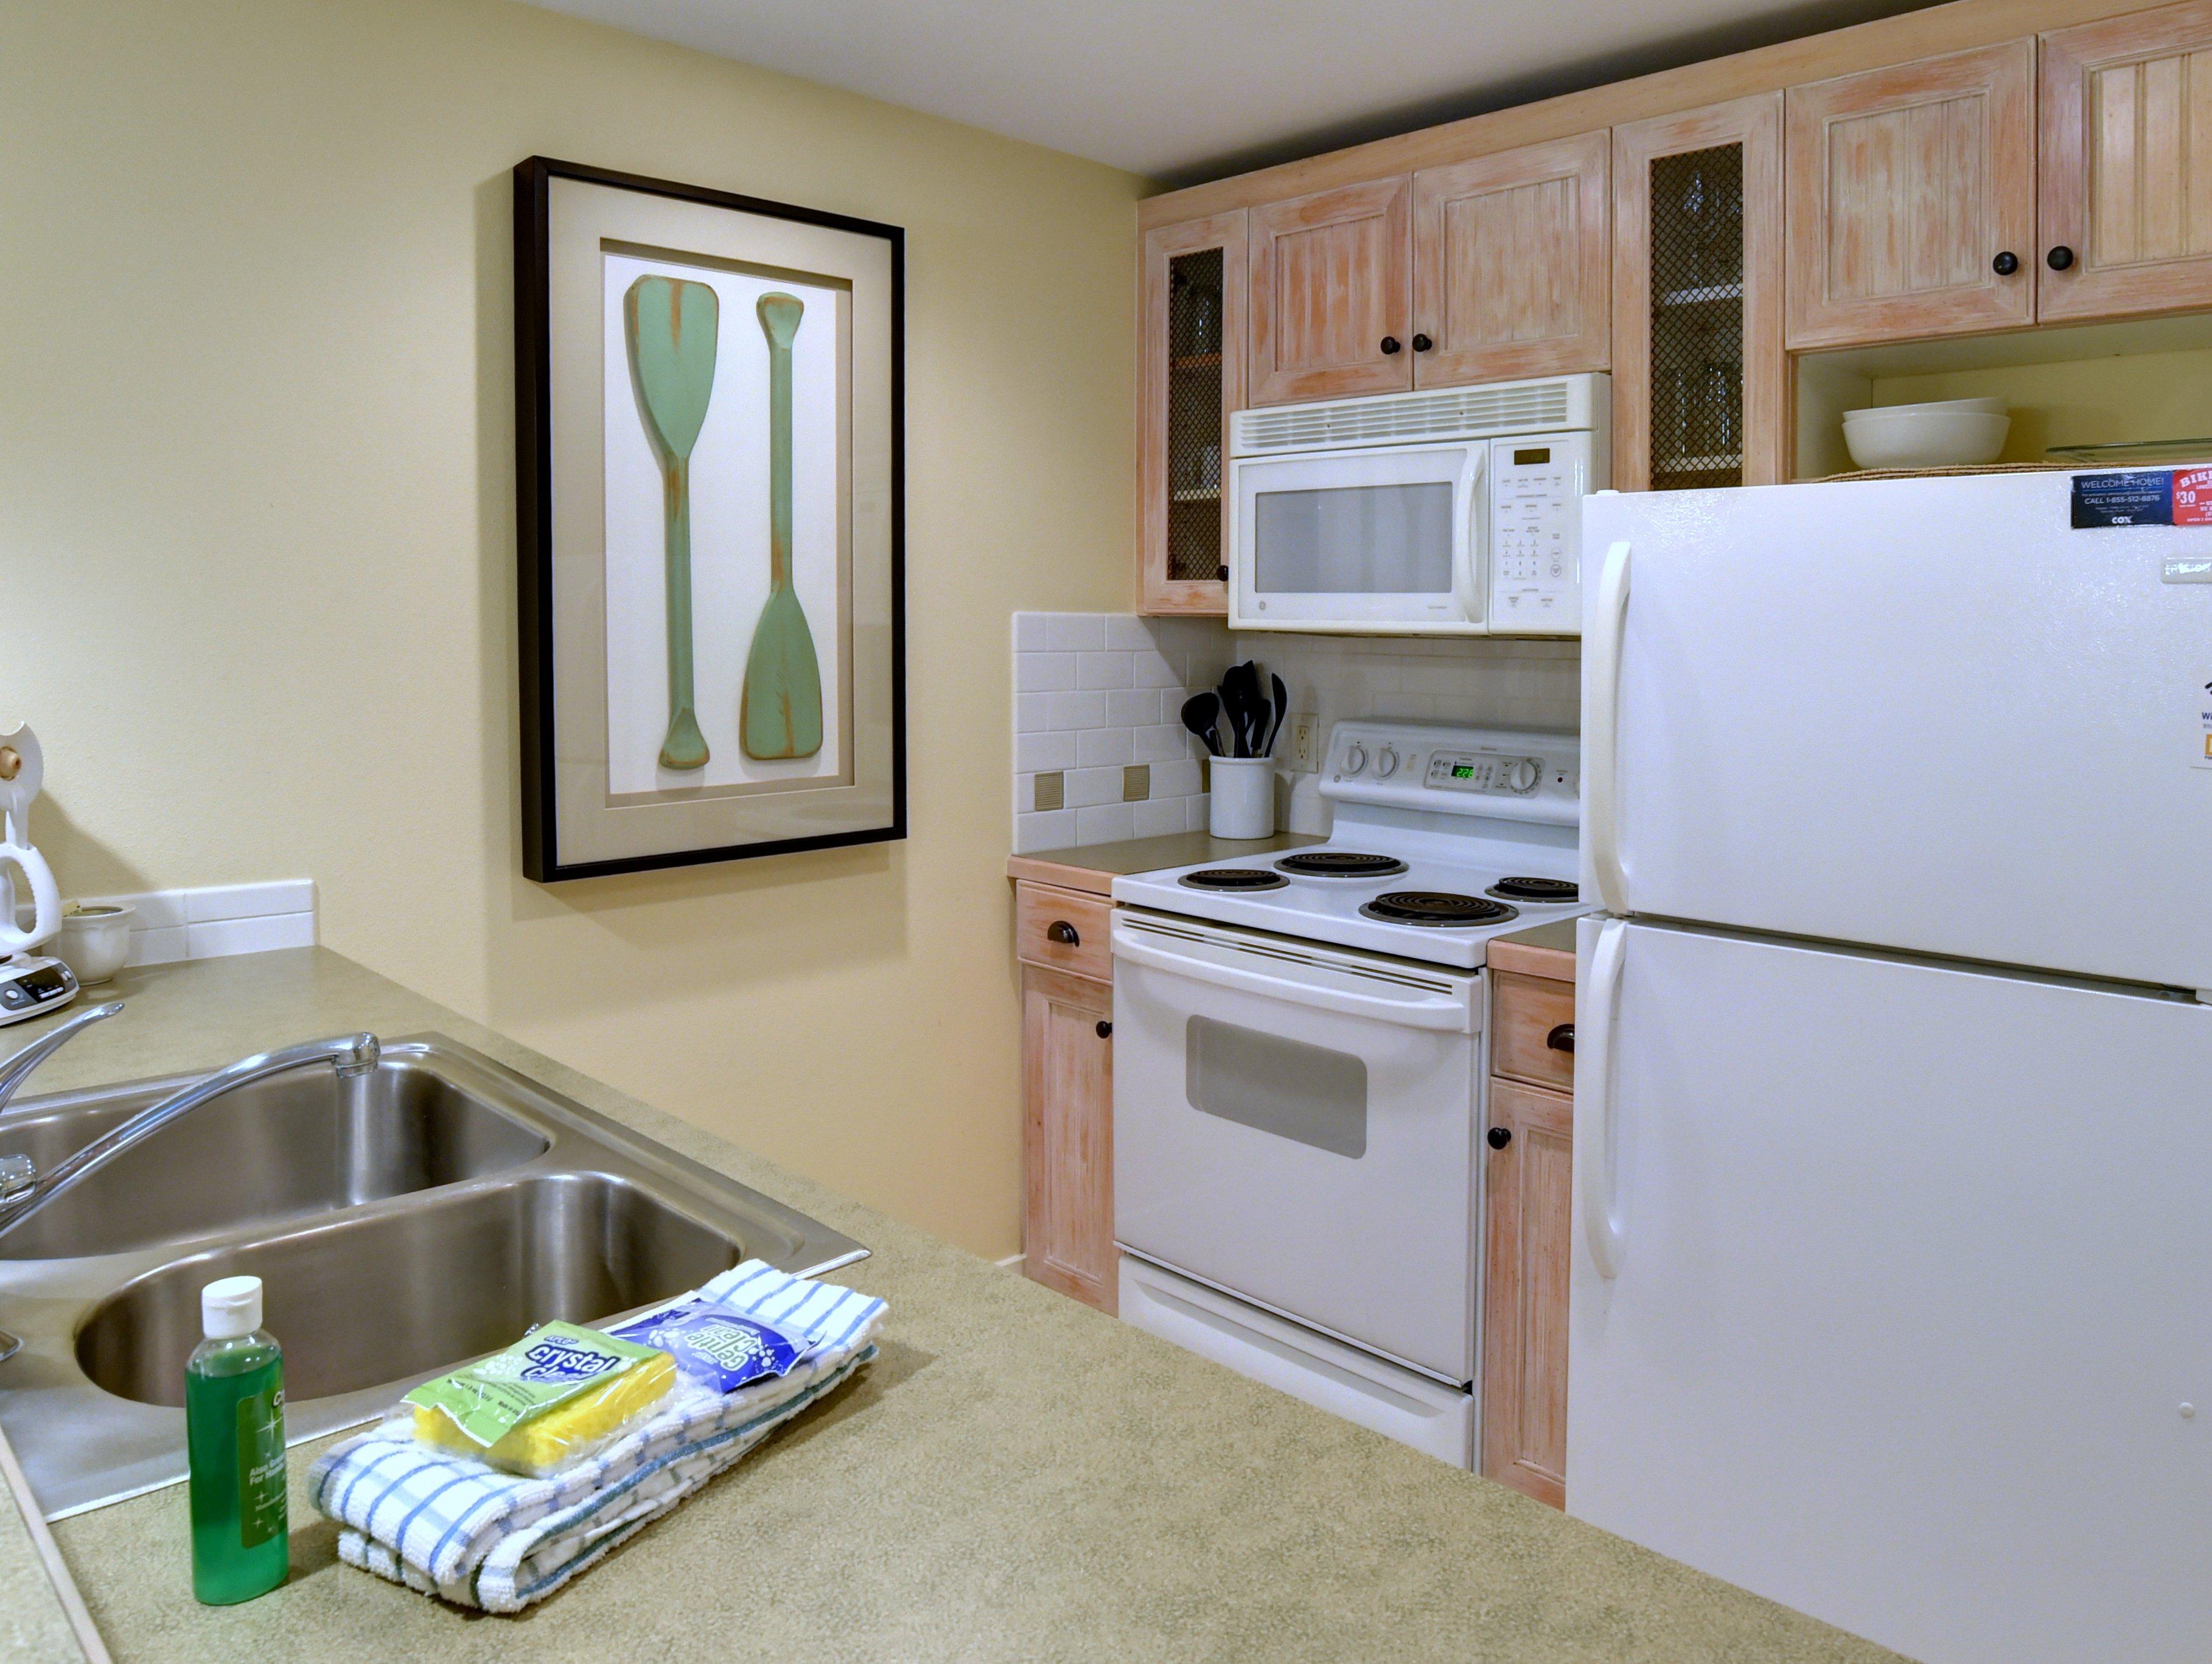 205 Pilot House Condo rental in Pilot House at Sandestin in Destin Florida - #6